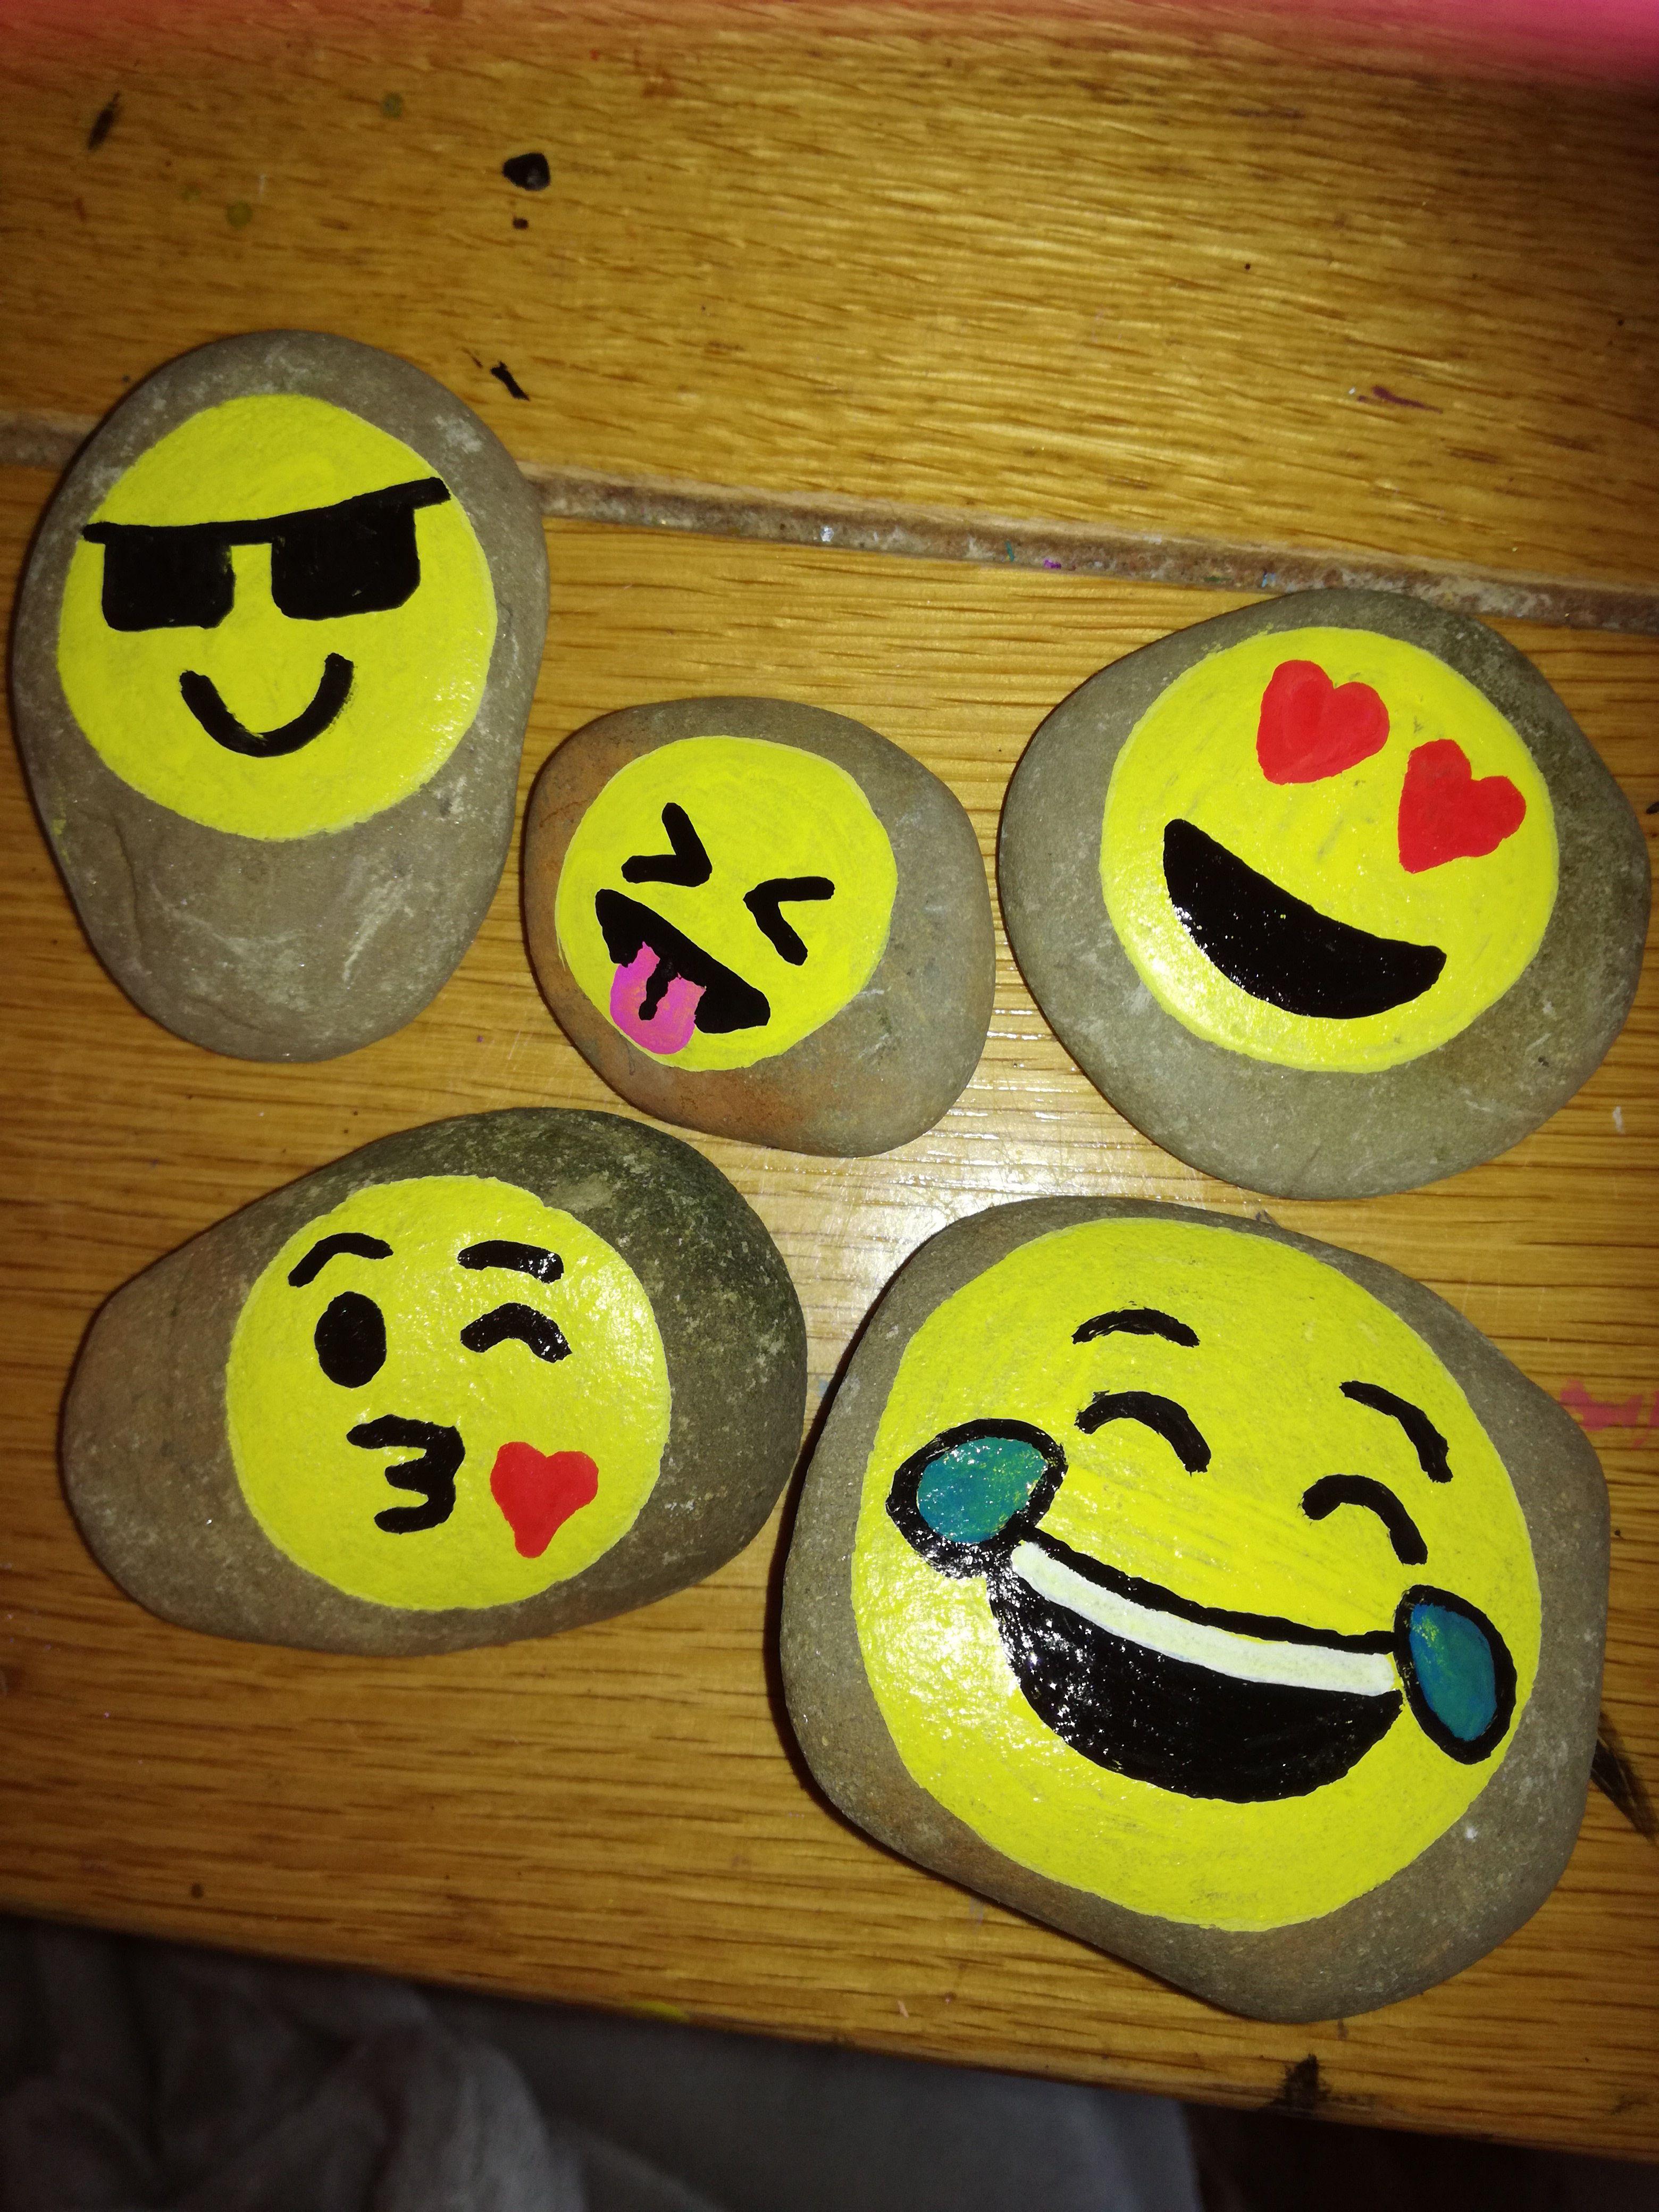 Emoji Painted Rocks Painted Rocks Painted Rocks Kids Rock Painting Ideas Easy